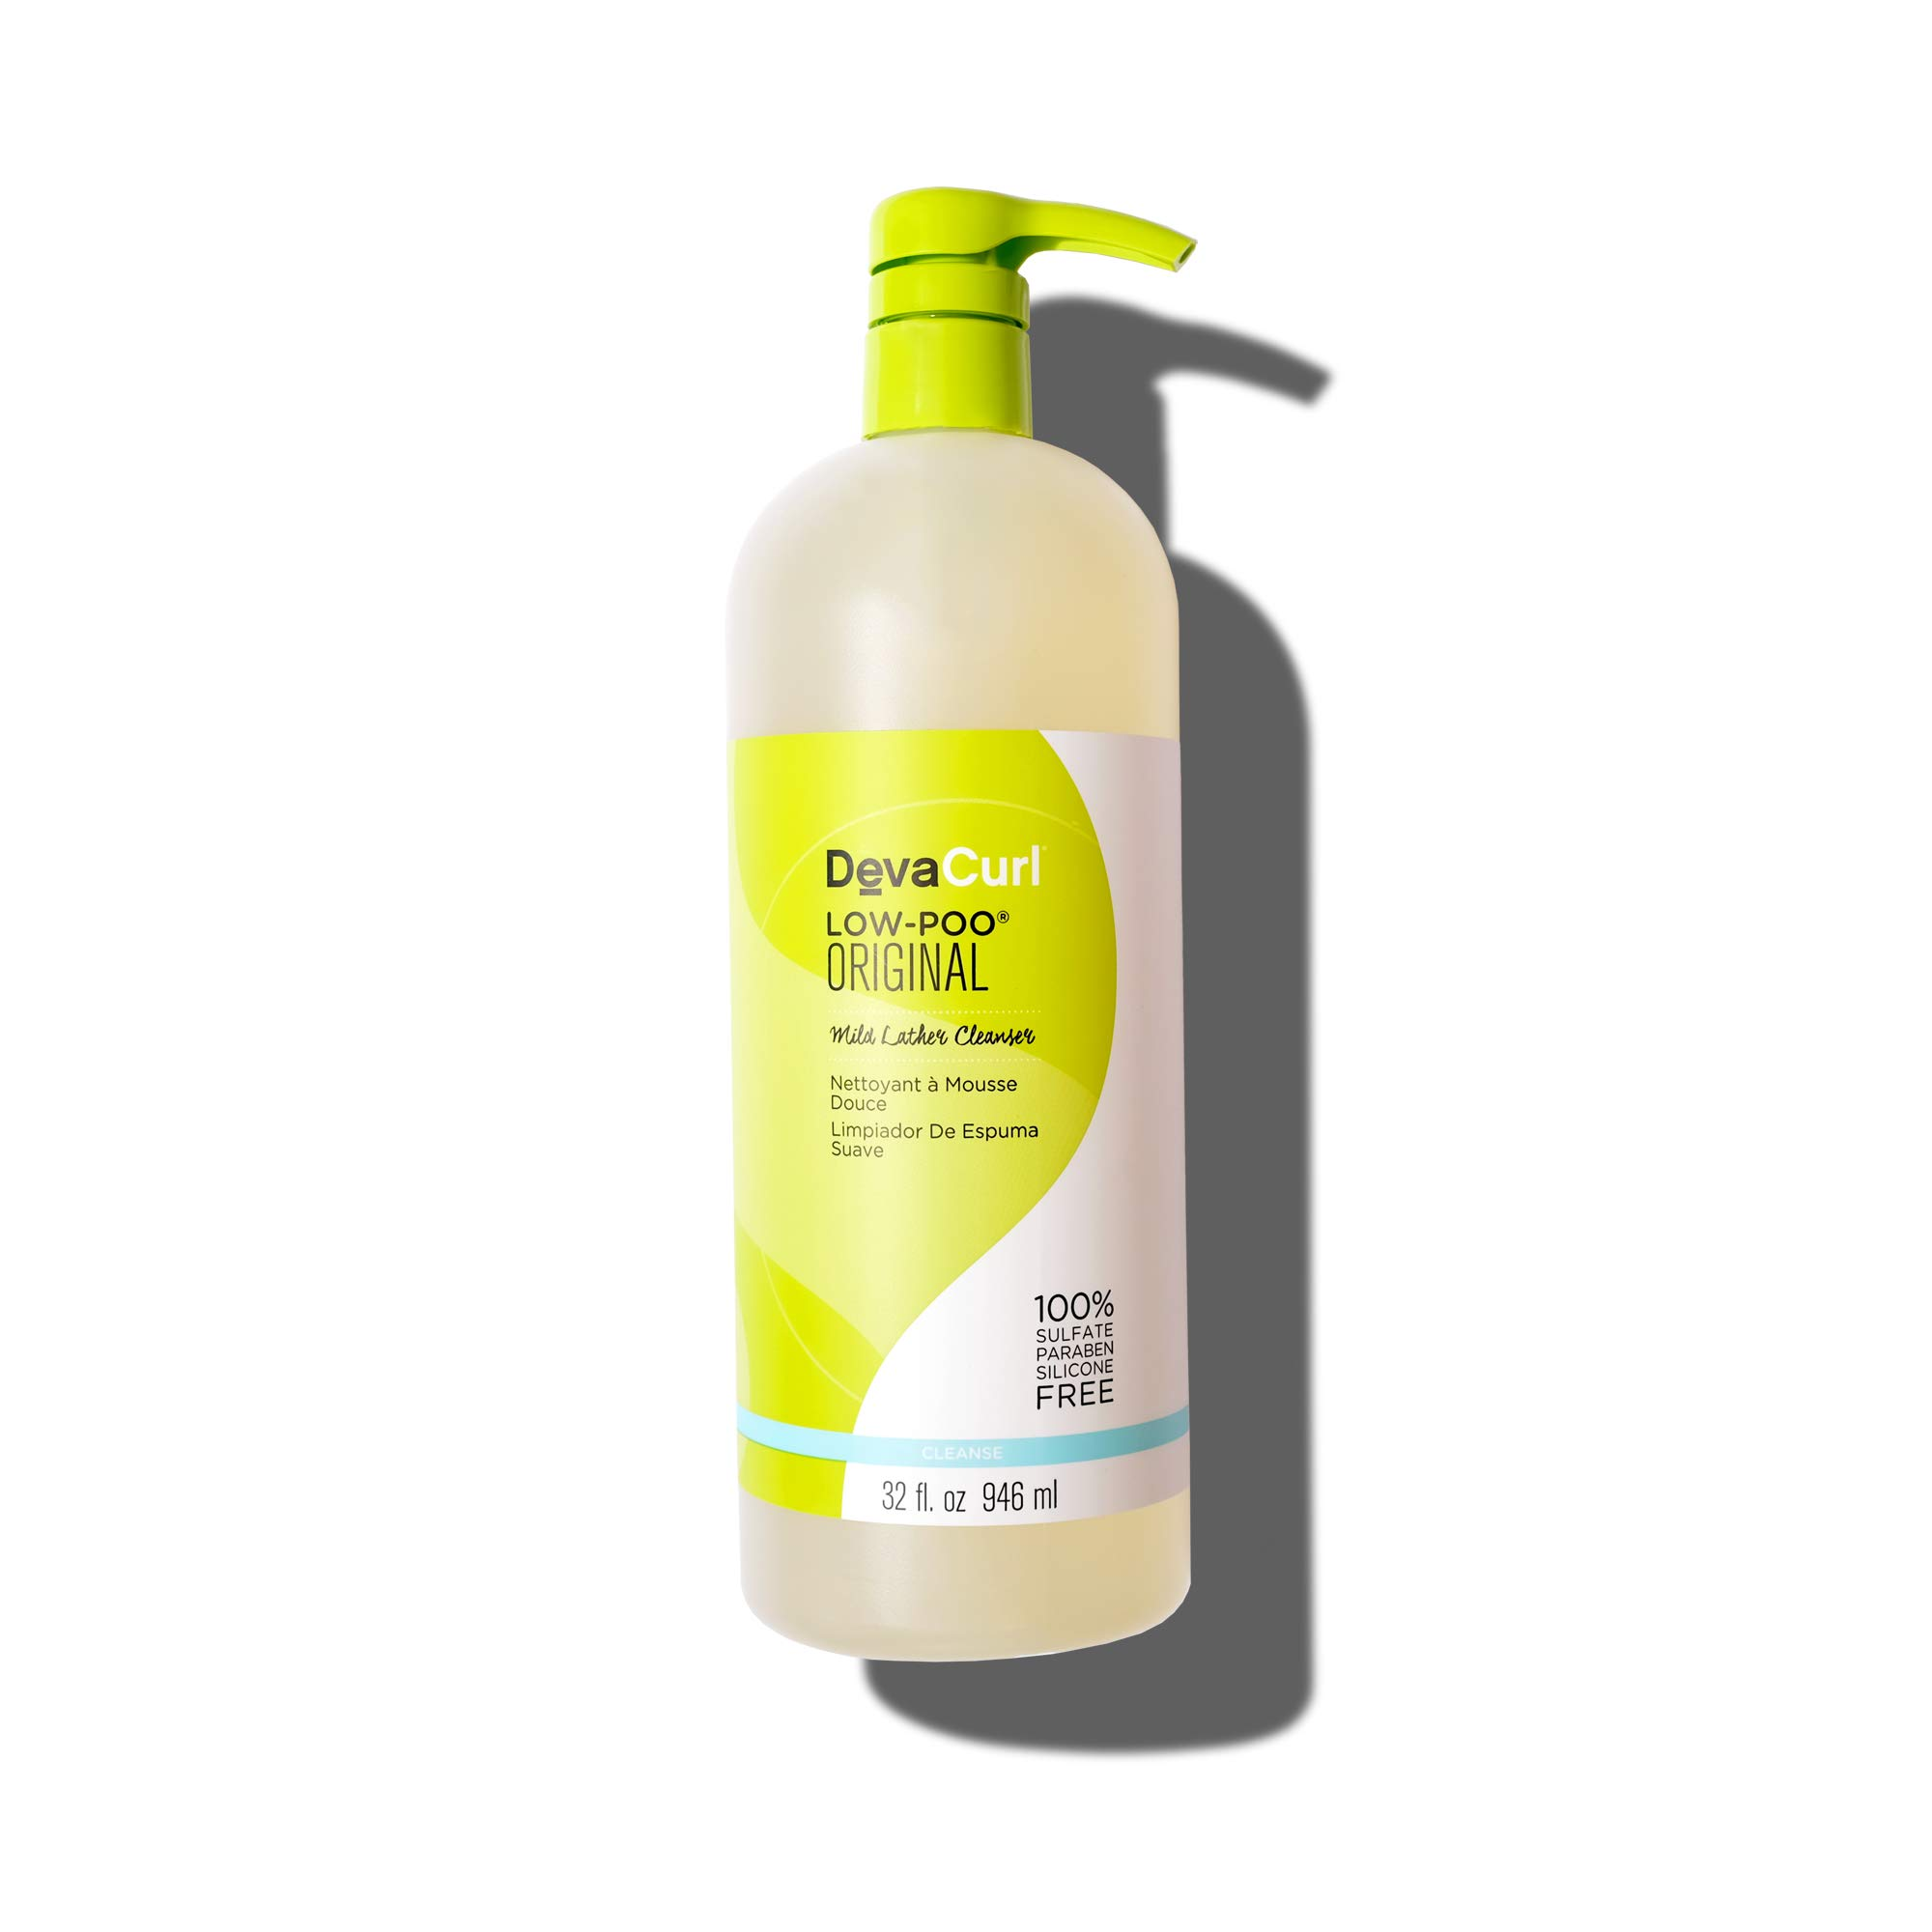 DevaCurl Low Poo Mild Lather Cleanser; 32oz by DevaCurl